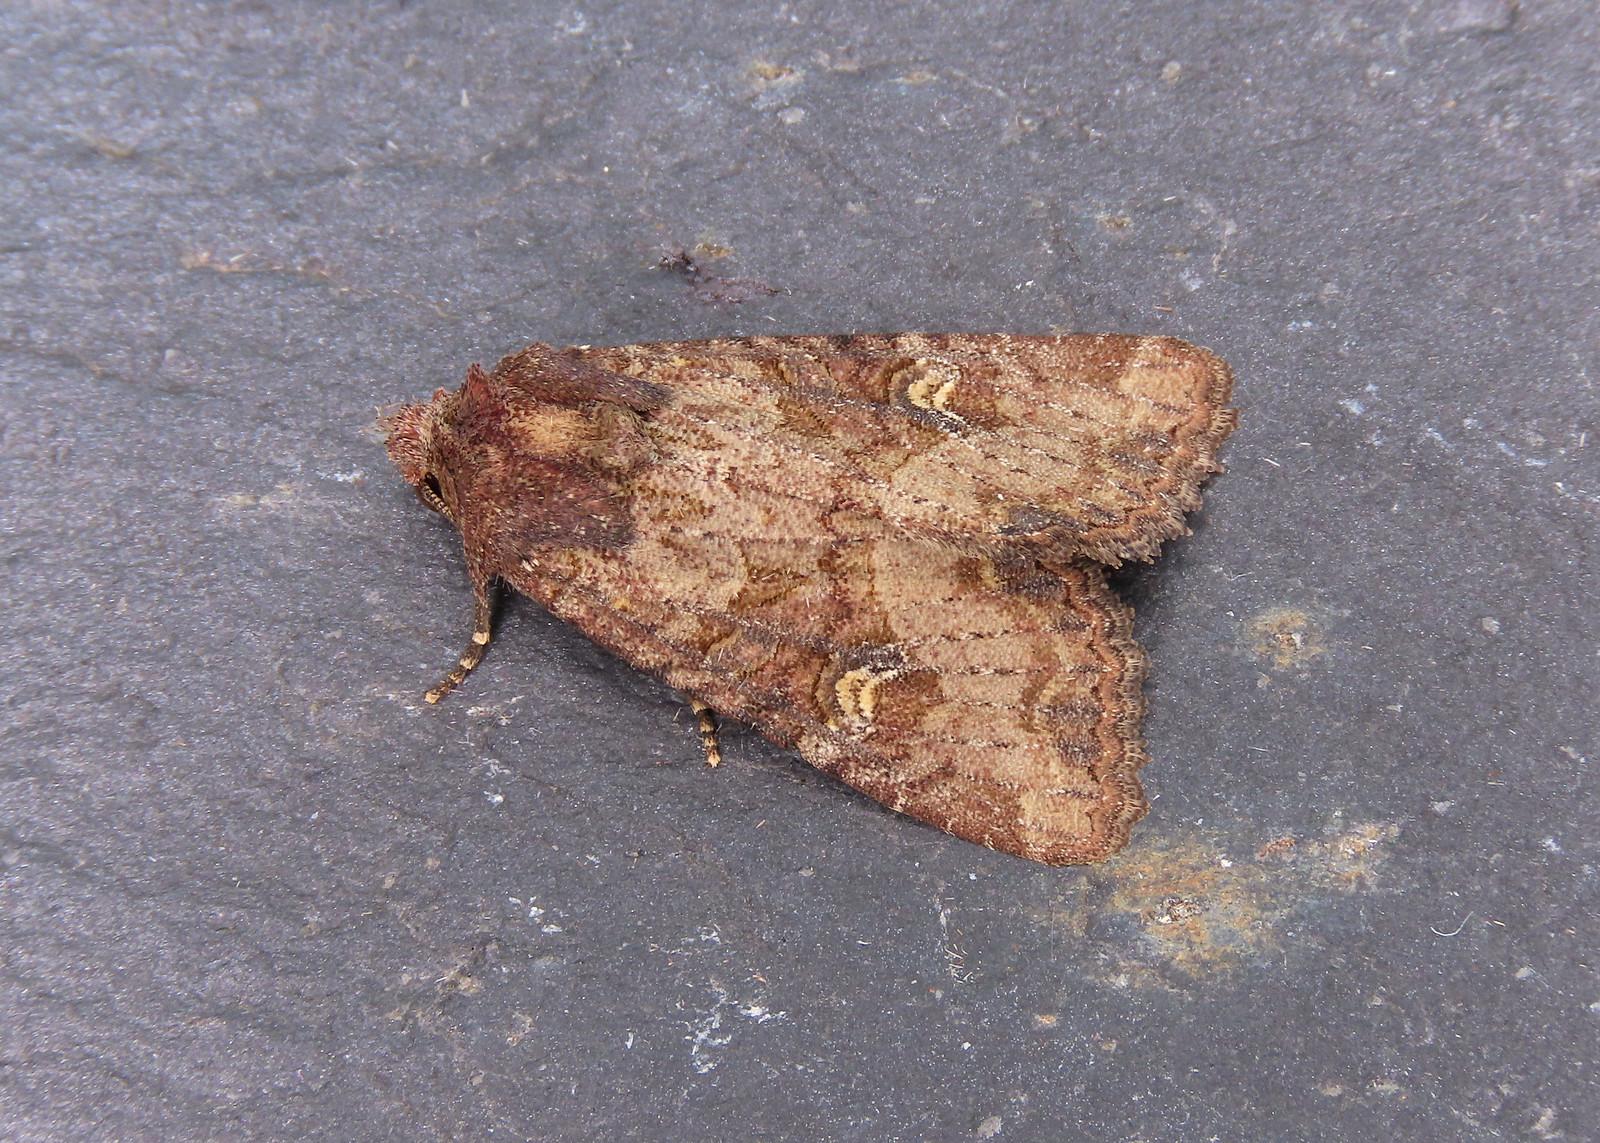 73.169x BF2343 Common Rustic agg. - Mesapamea secalis agg.